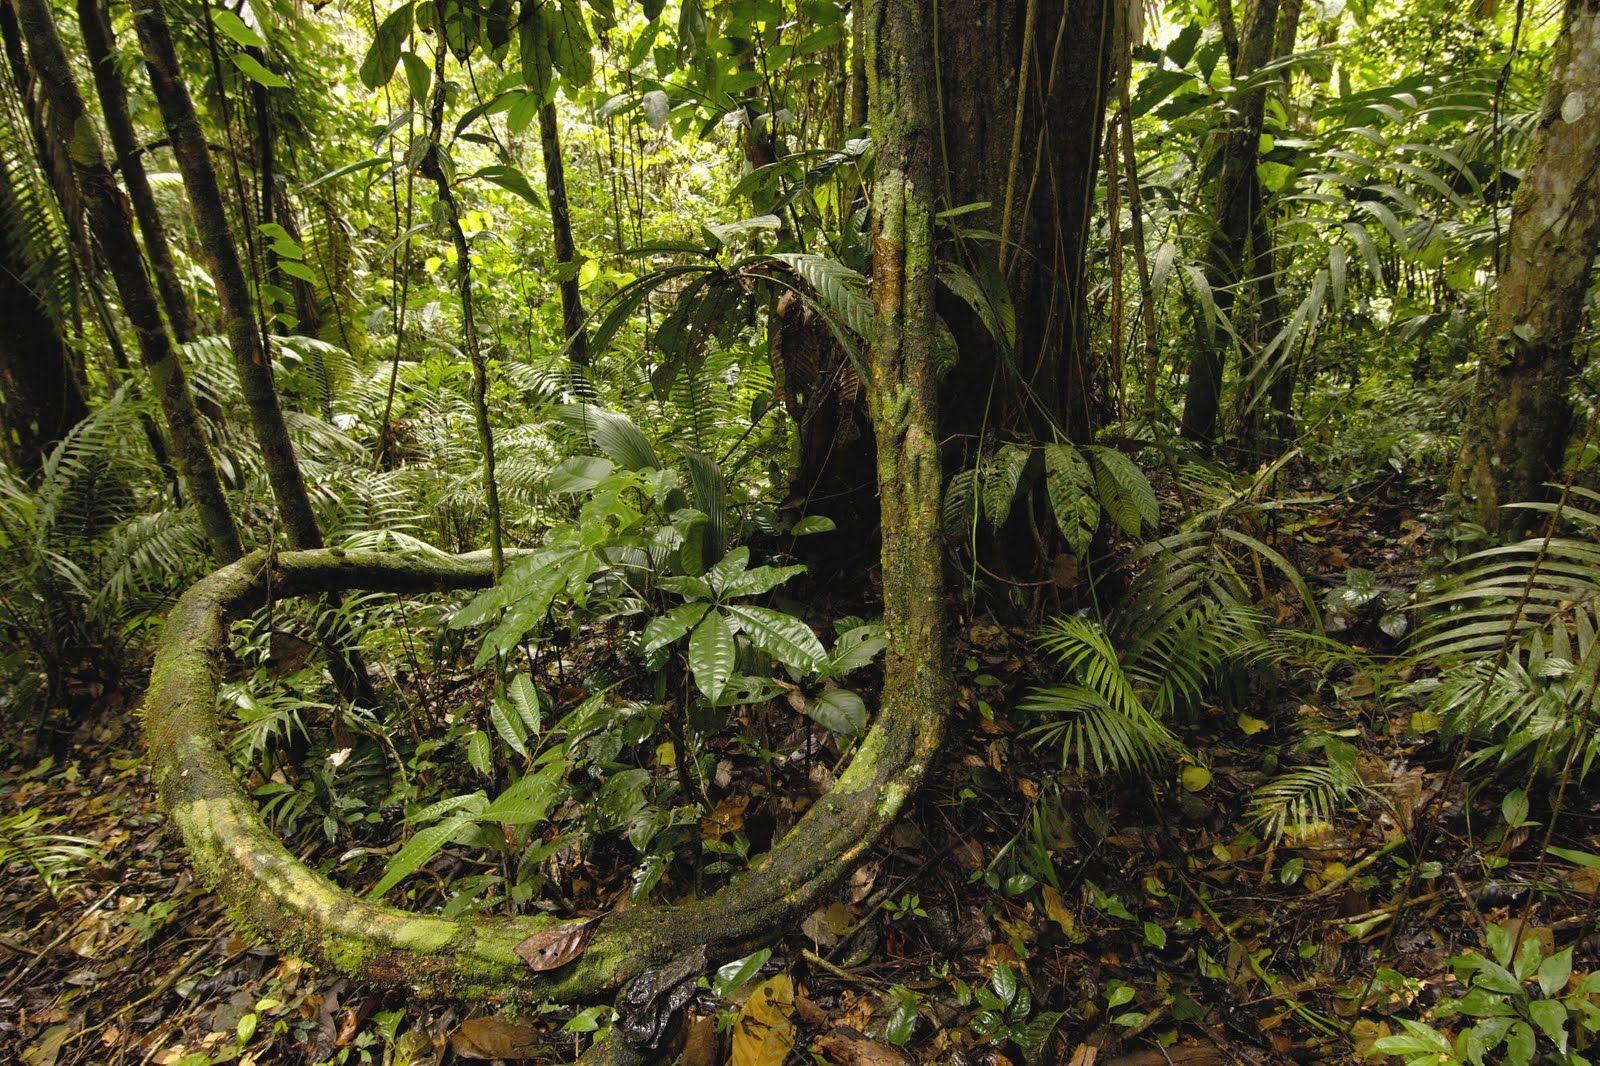 Amazon Rainforest Amazon Rainforest Rainforest Nature